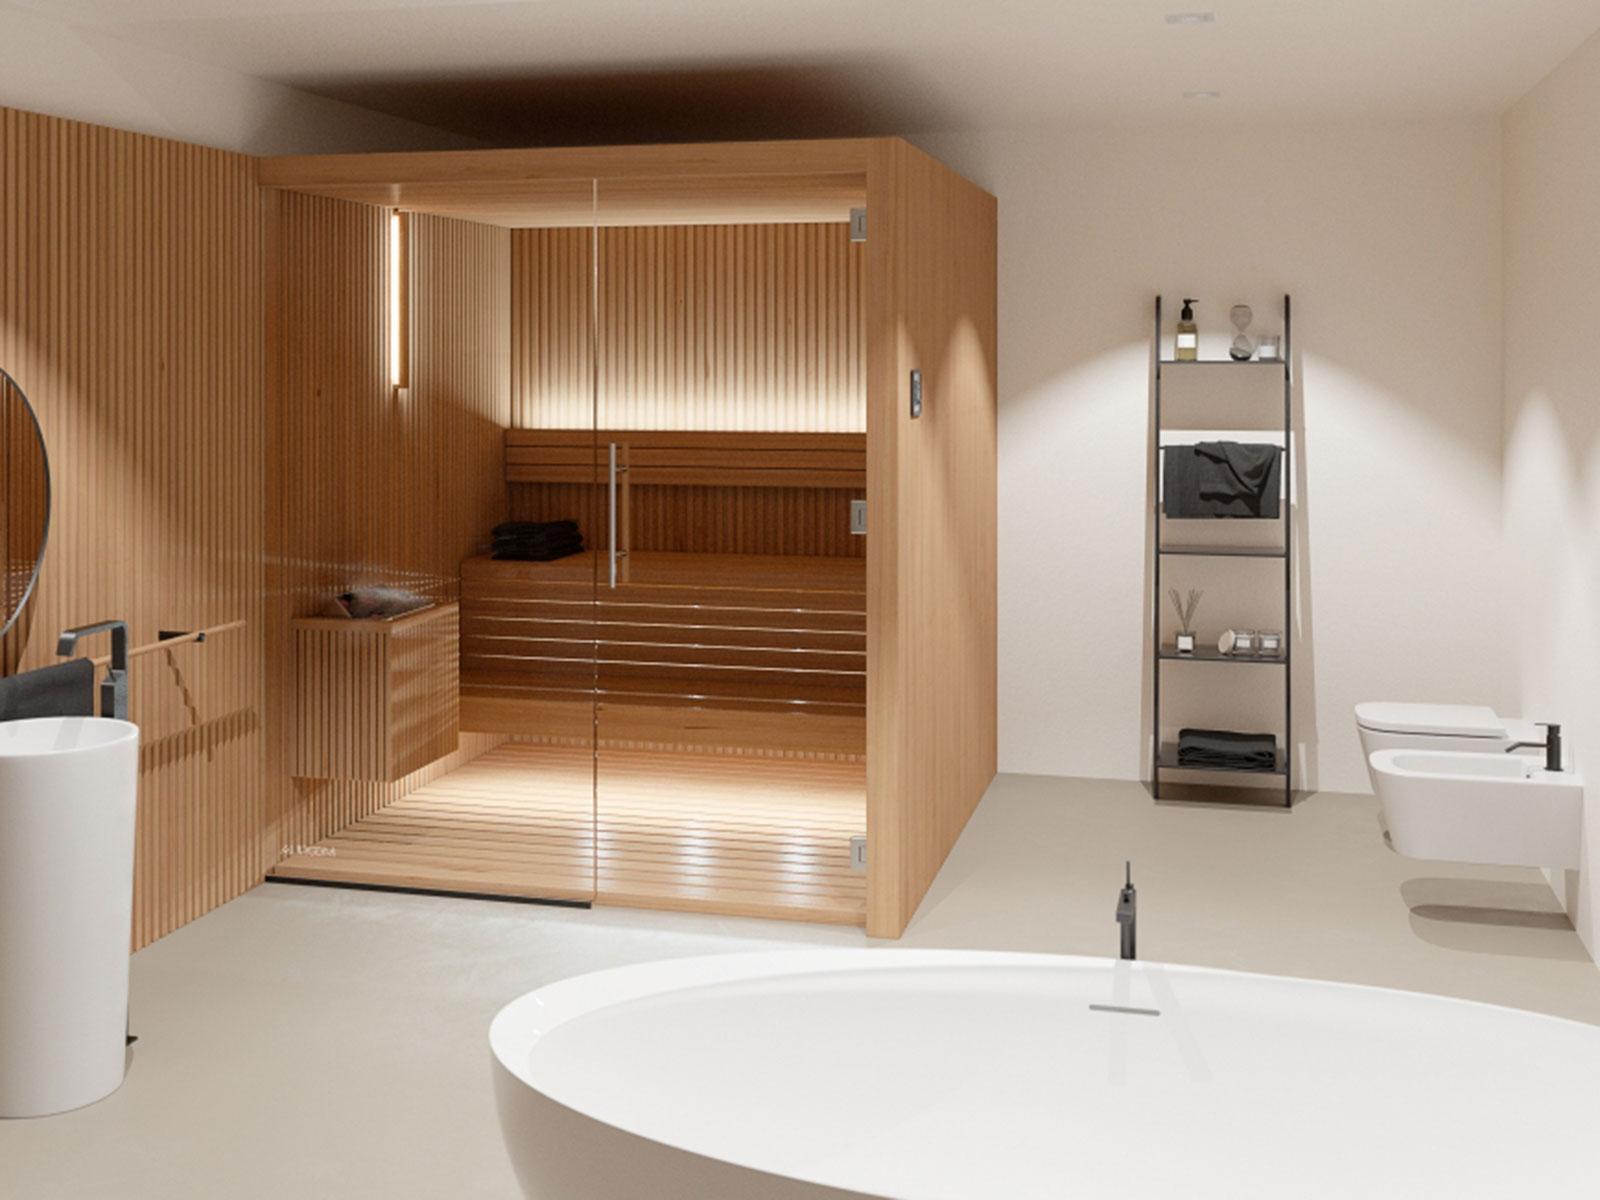 sauna-private-spa-house-xane